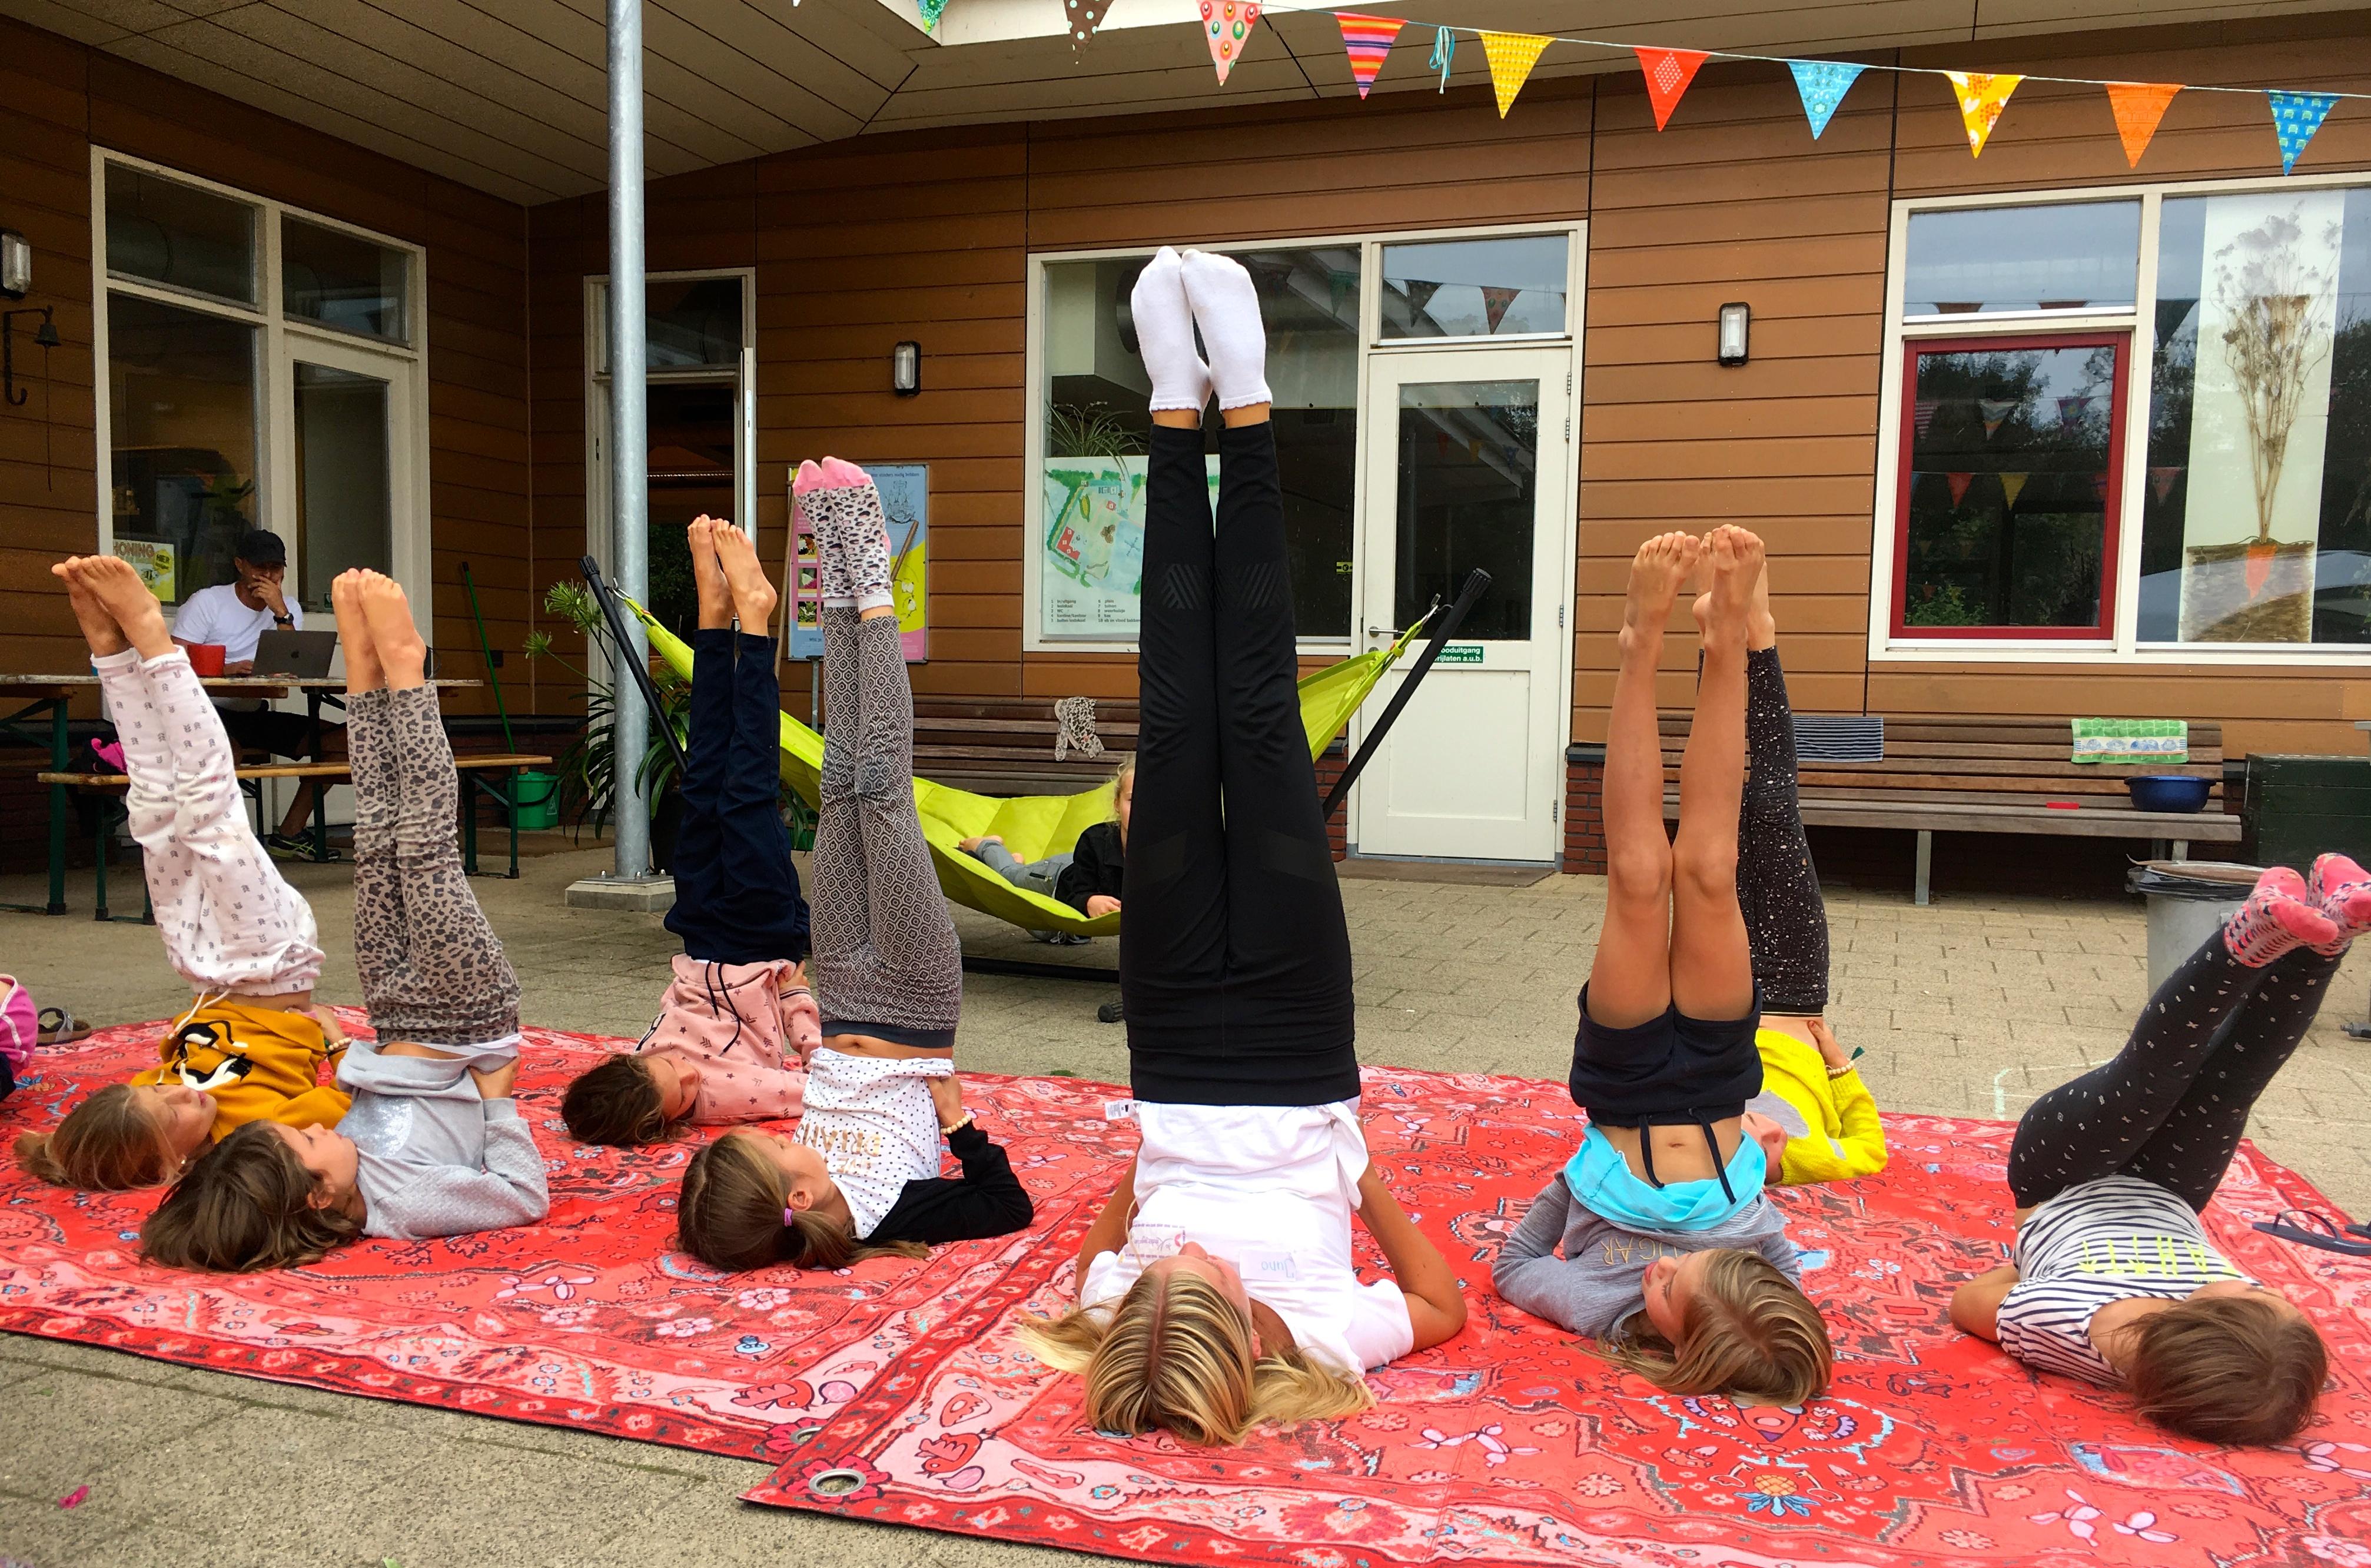 de Kinderyogatuin yogakamp zomerkamp kinderyoga - de kaars - kinderyoga mindfulness meditatie massage buitenyoga Aemstel schooltuin Amsterdam Amstelveen